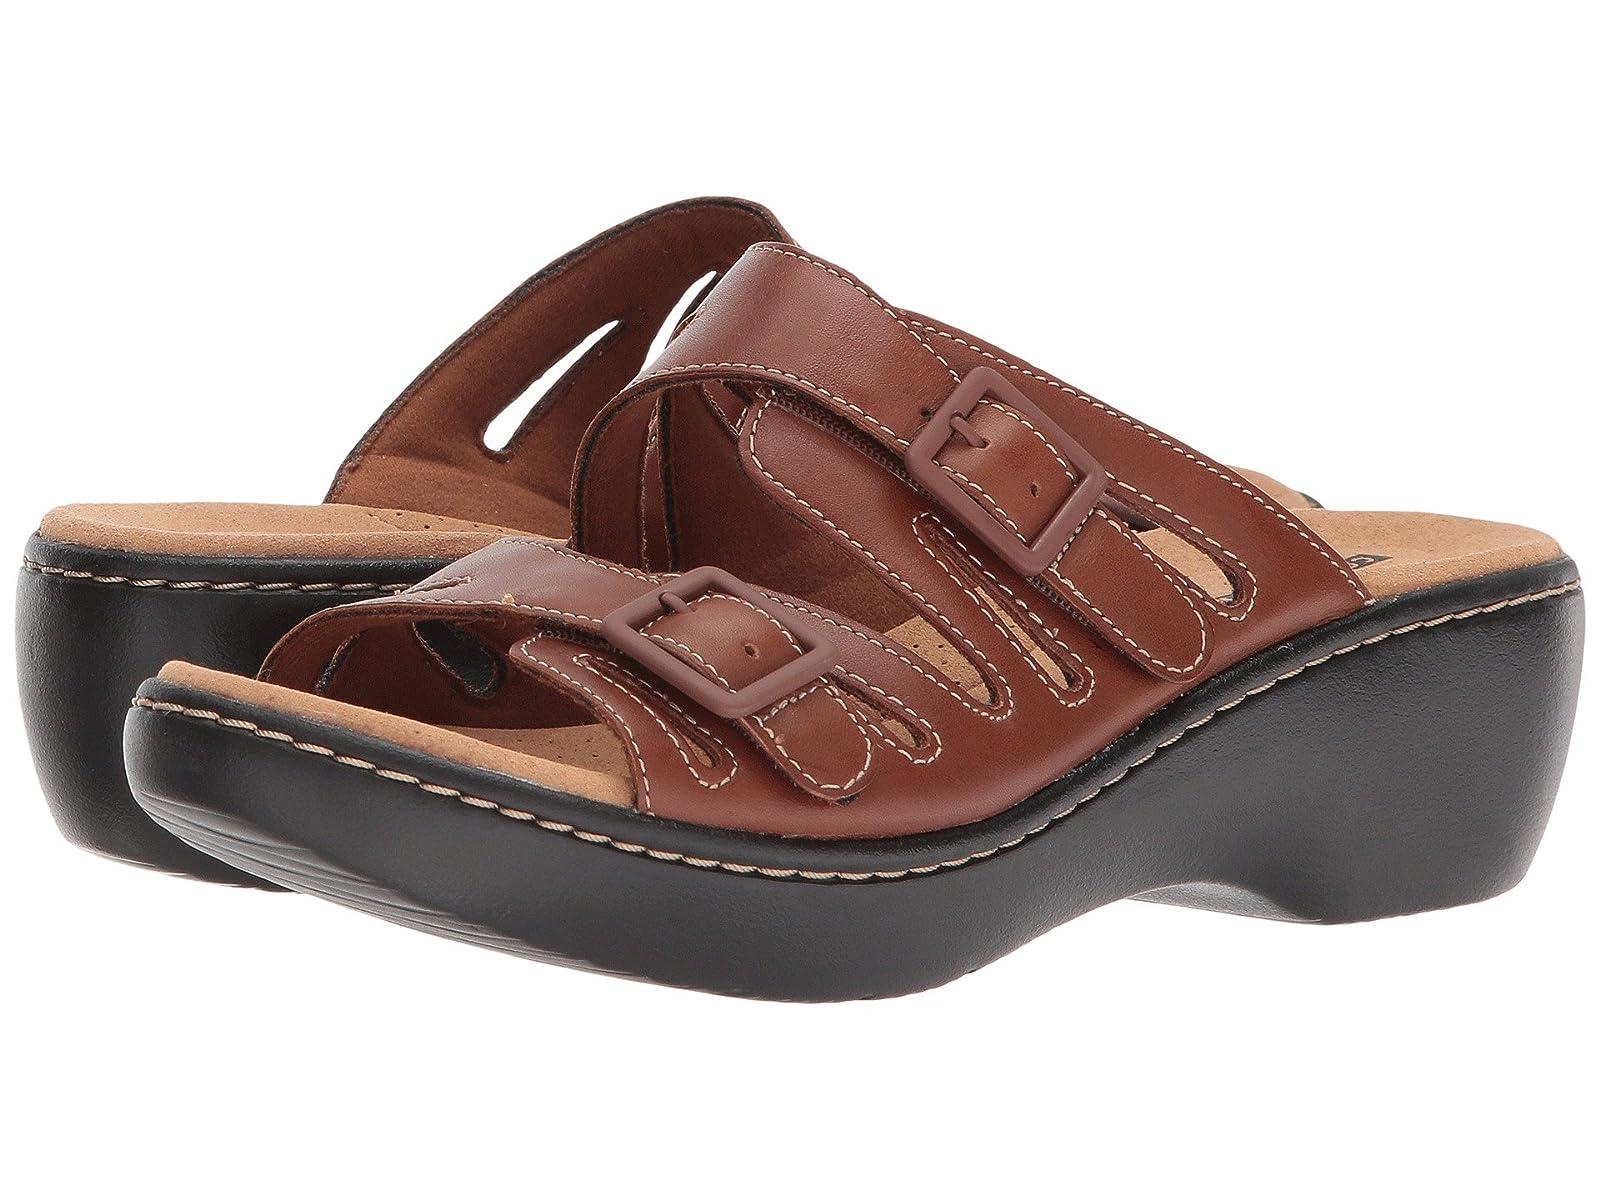 Clarks Delana LiriComfortable and distinctive shoes